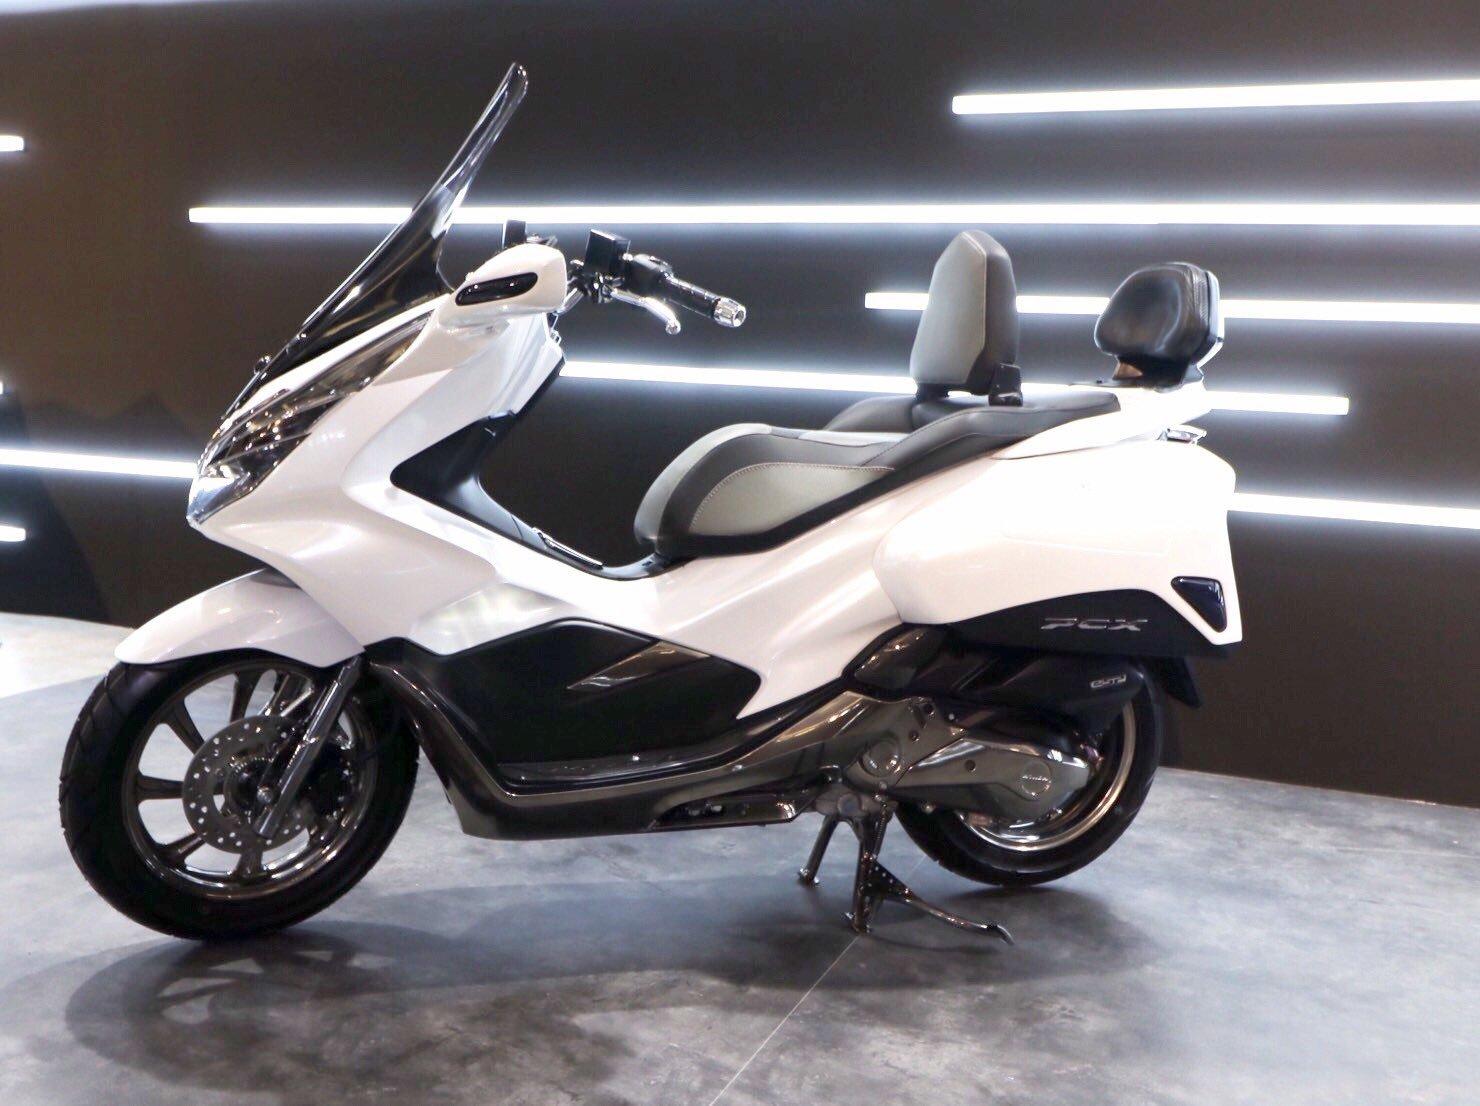 Top Harga Modifikasi Honda Pcx 150 Touring Modifhits